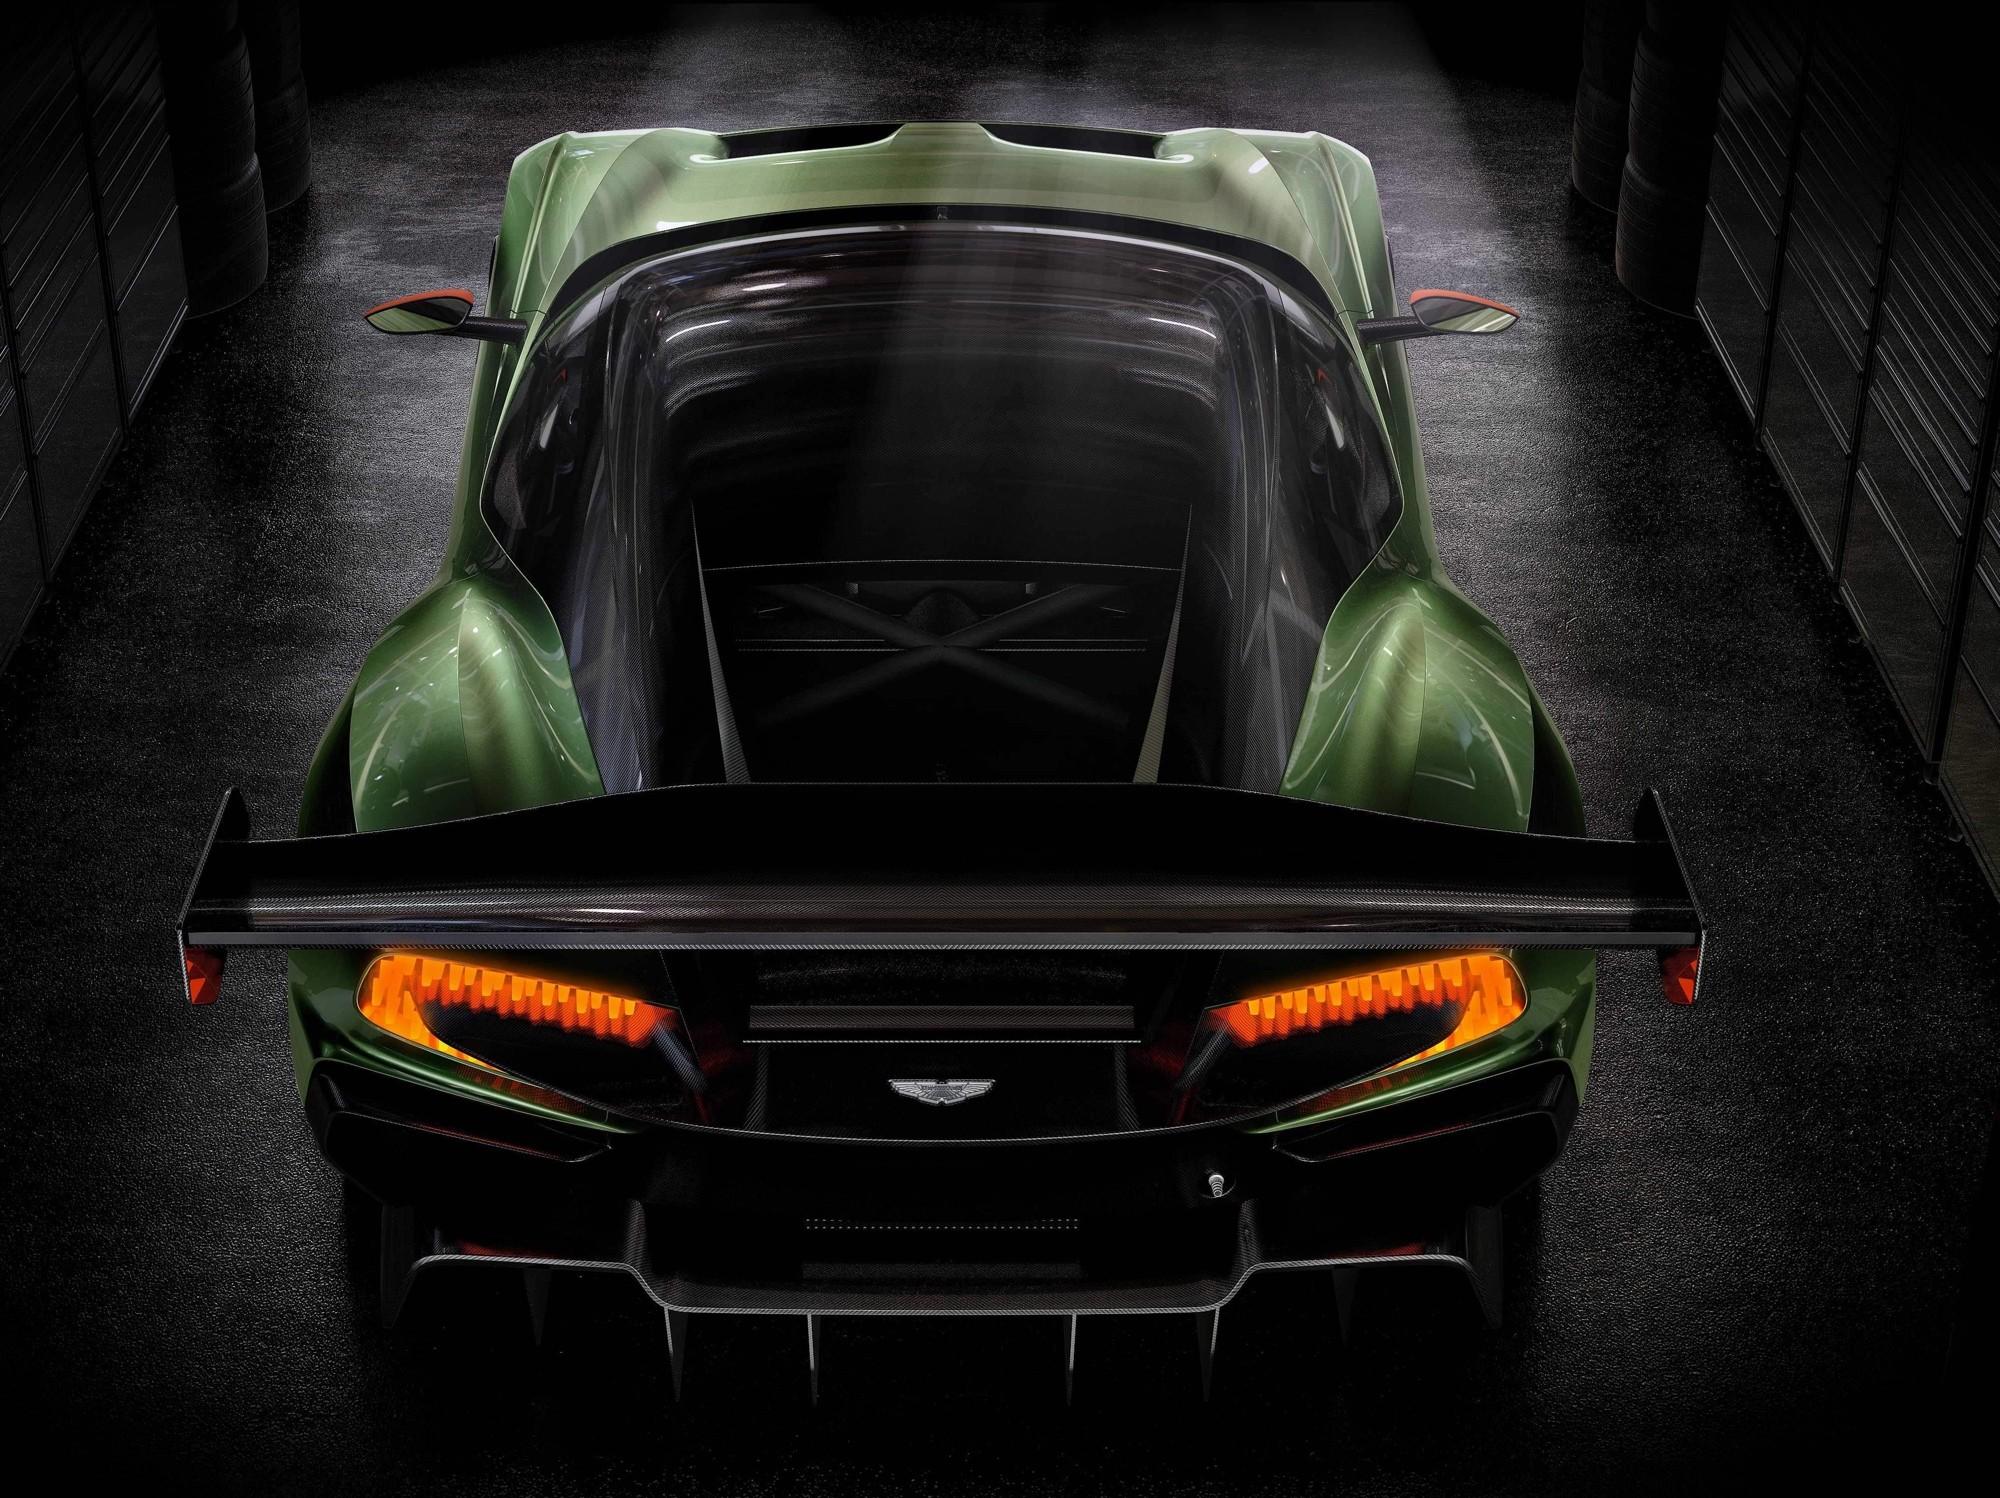 Aston Martin Vulcan суперкар скачать